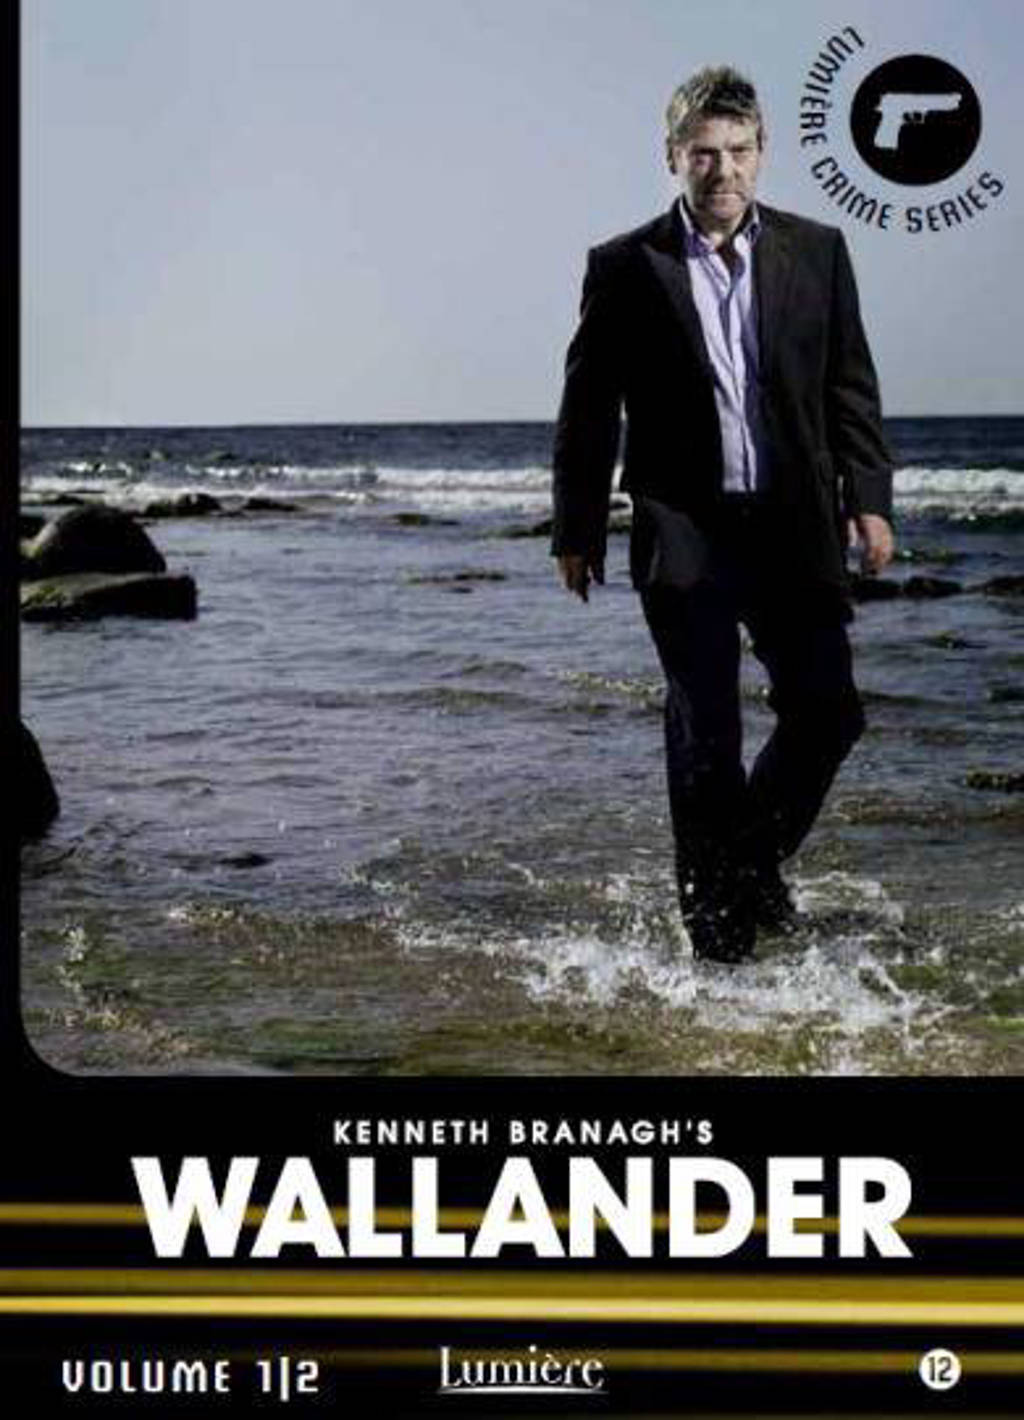 Kenneth Branagh's Wallander 1 & 2 (DVD)